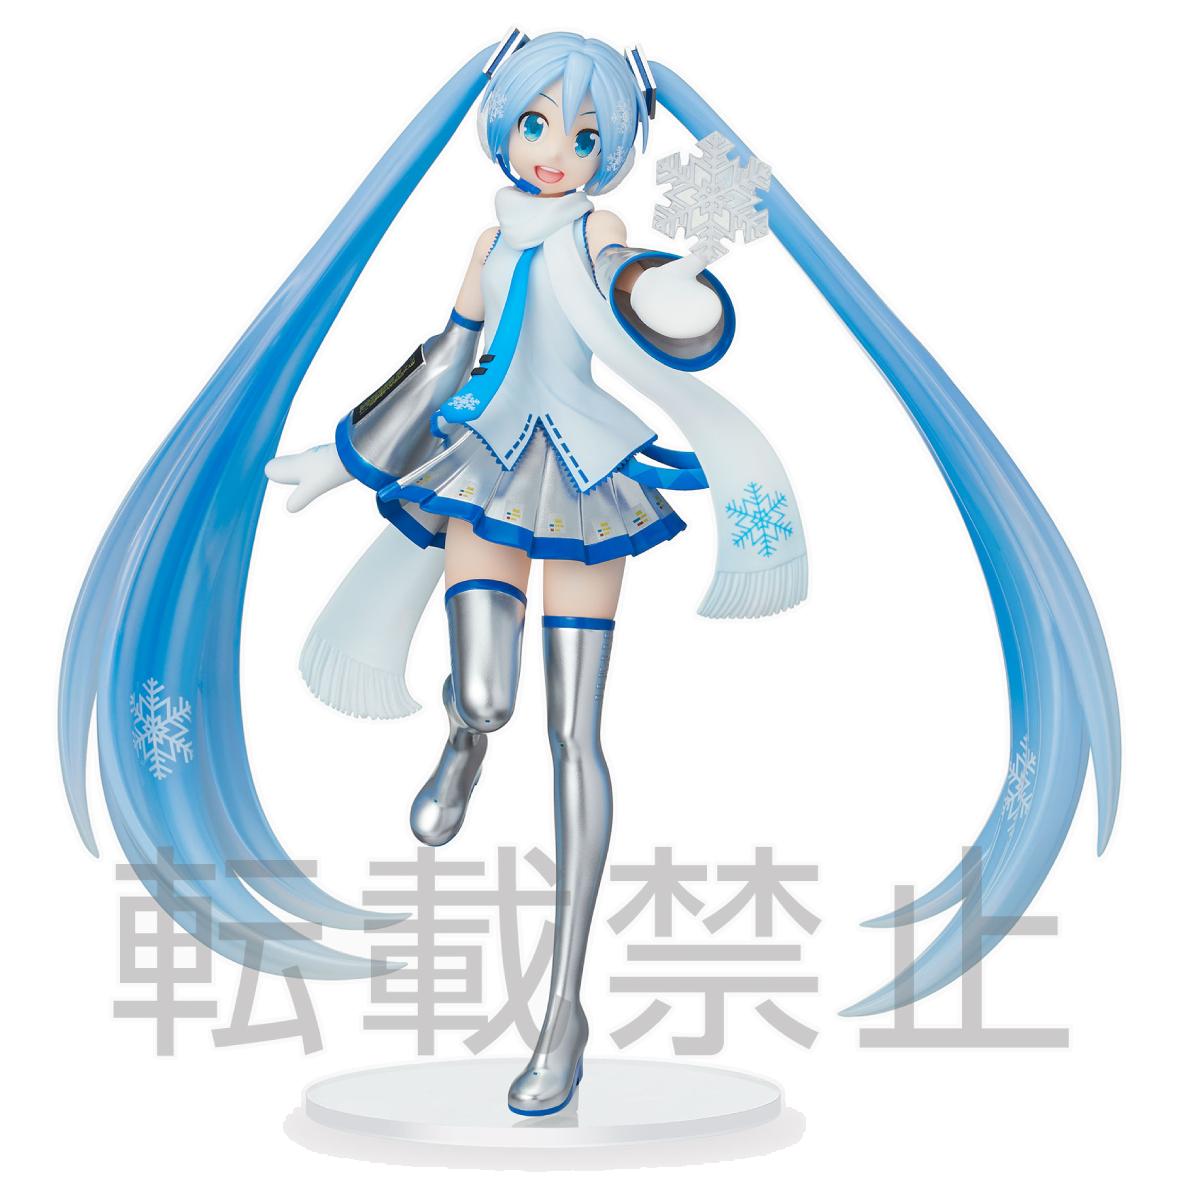 SG94560_-Hatsune_Miku_Series_SPM_Figure_SNOW_MIKU_-SNOW_MIKU_SKYTOWN_Ver.